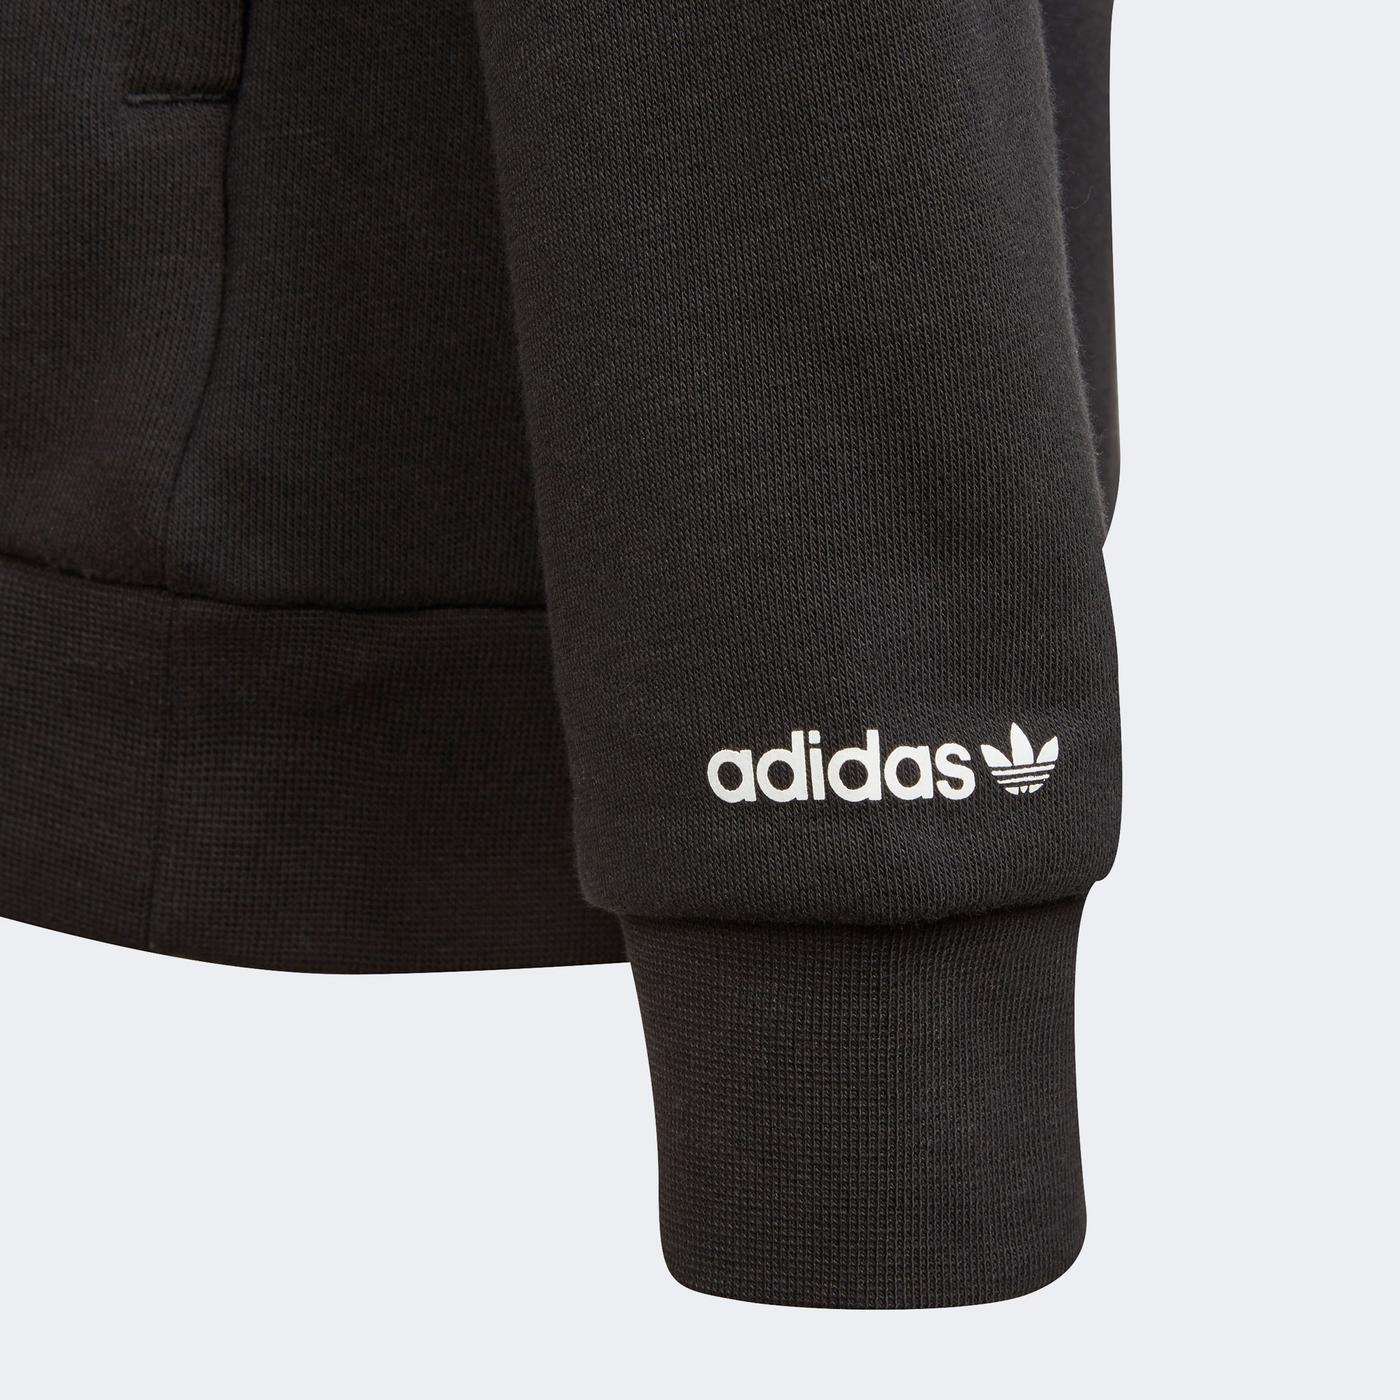 adidas Çocuk Siyah Sweatshirt